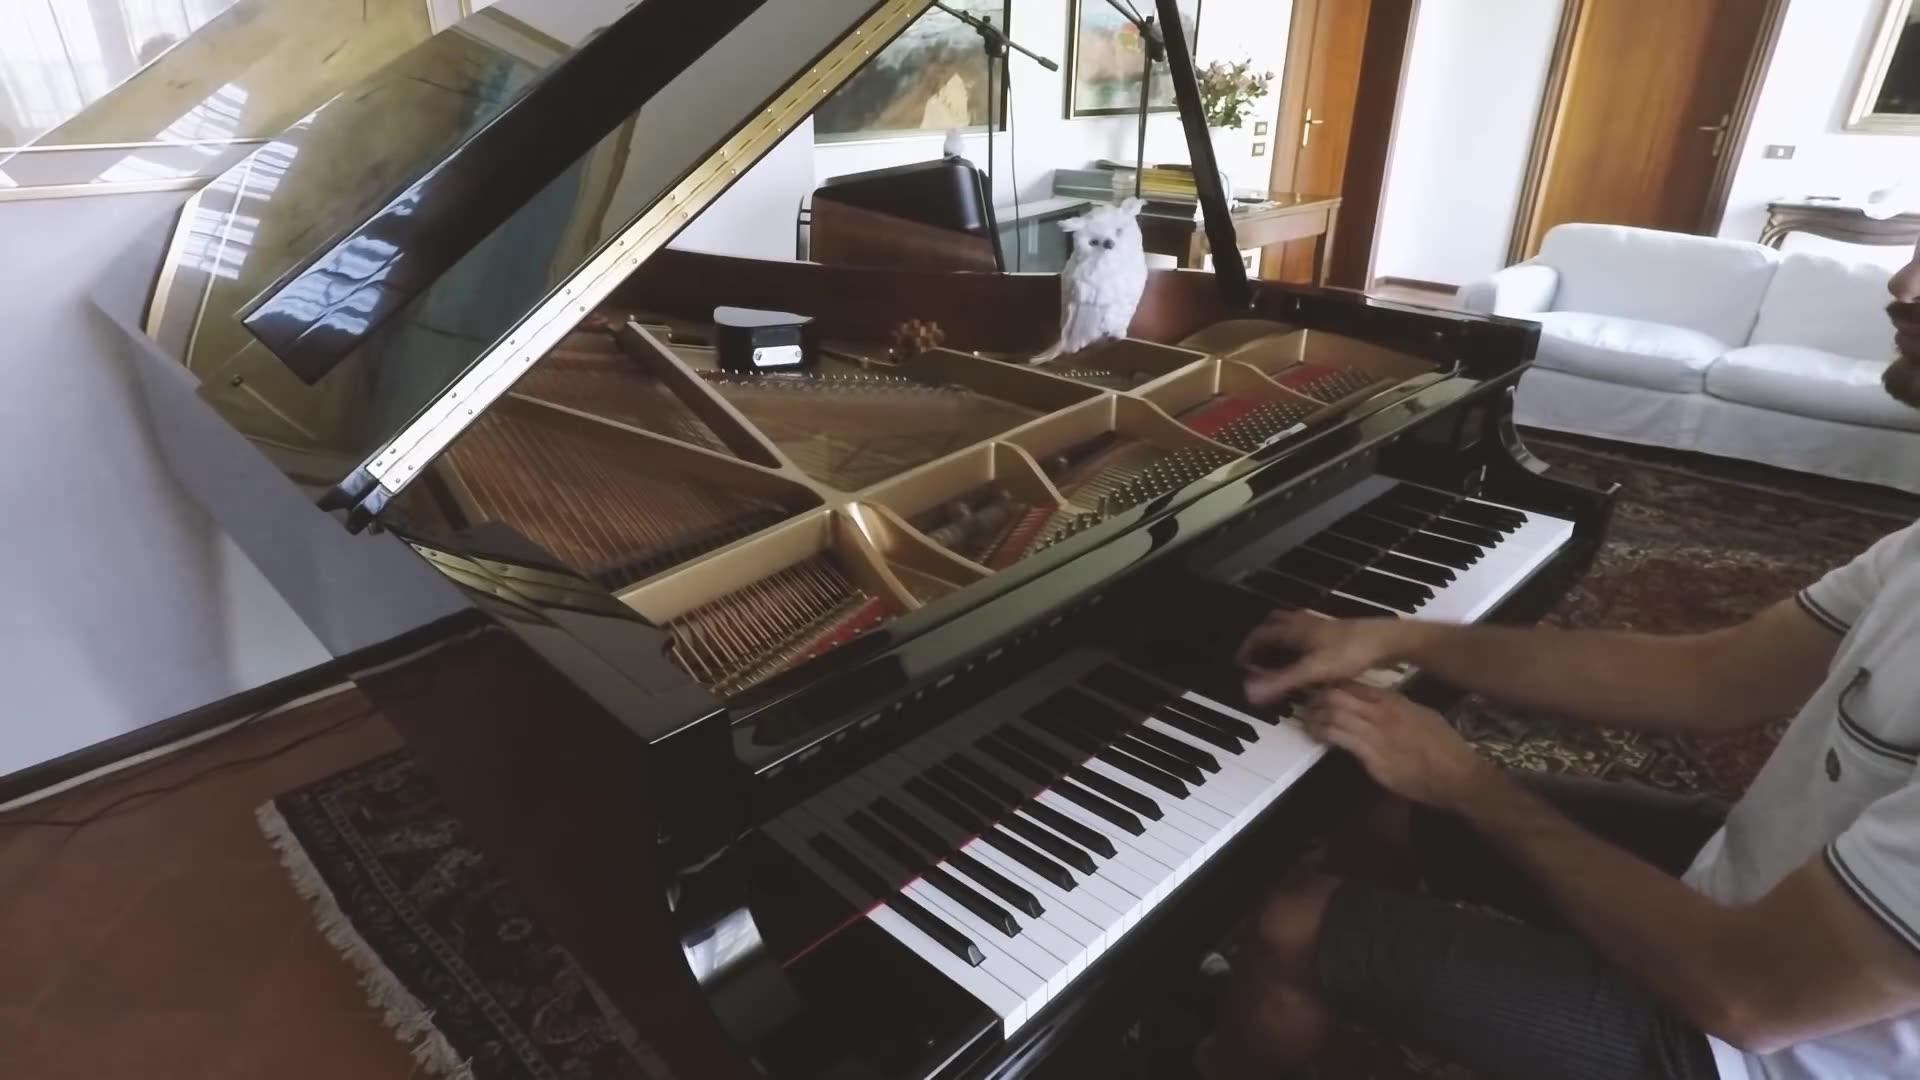 【YouTube搬运】Edoardo Brotto - Prelude in G major Op.9 N.1 - 致敬拉赫玛尼诺夫